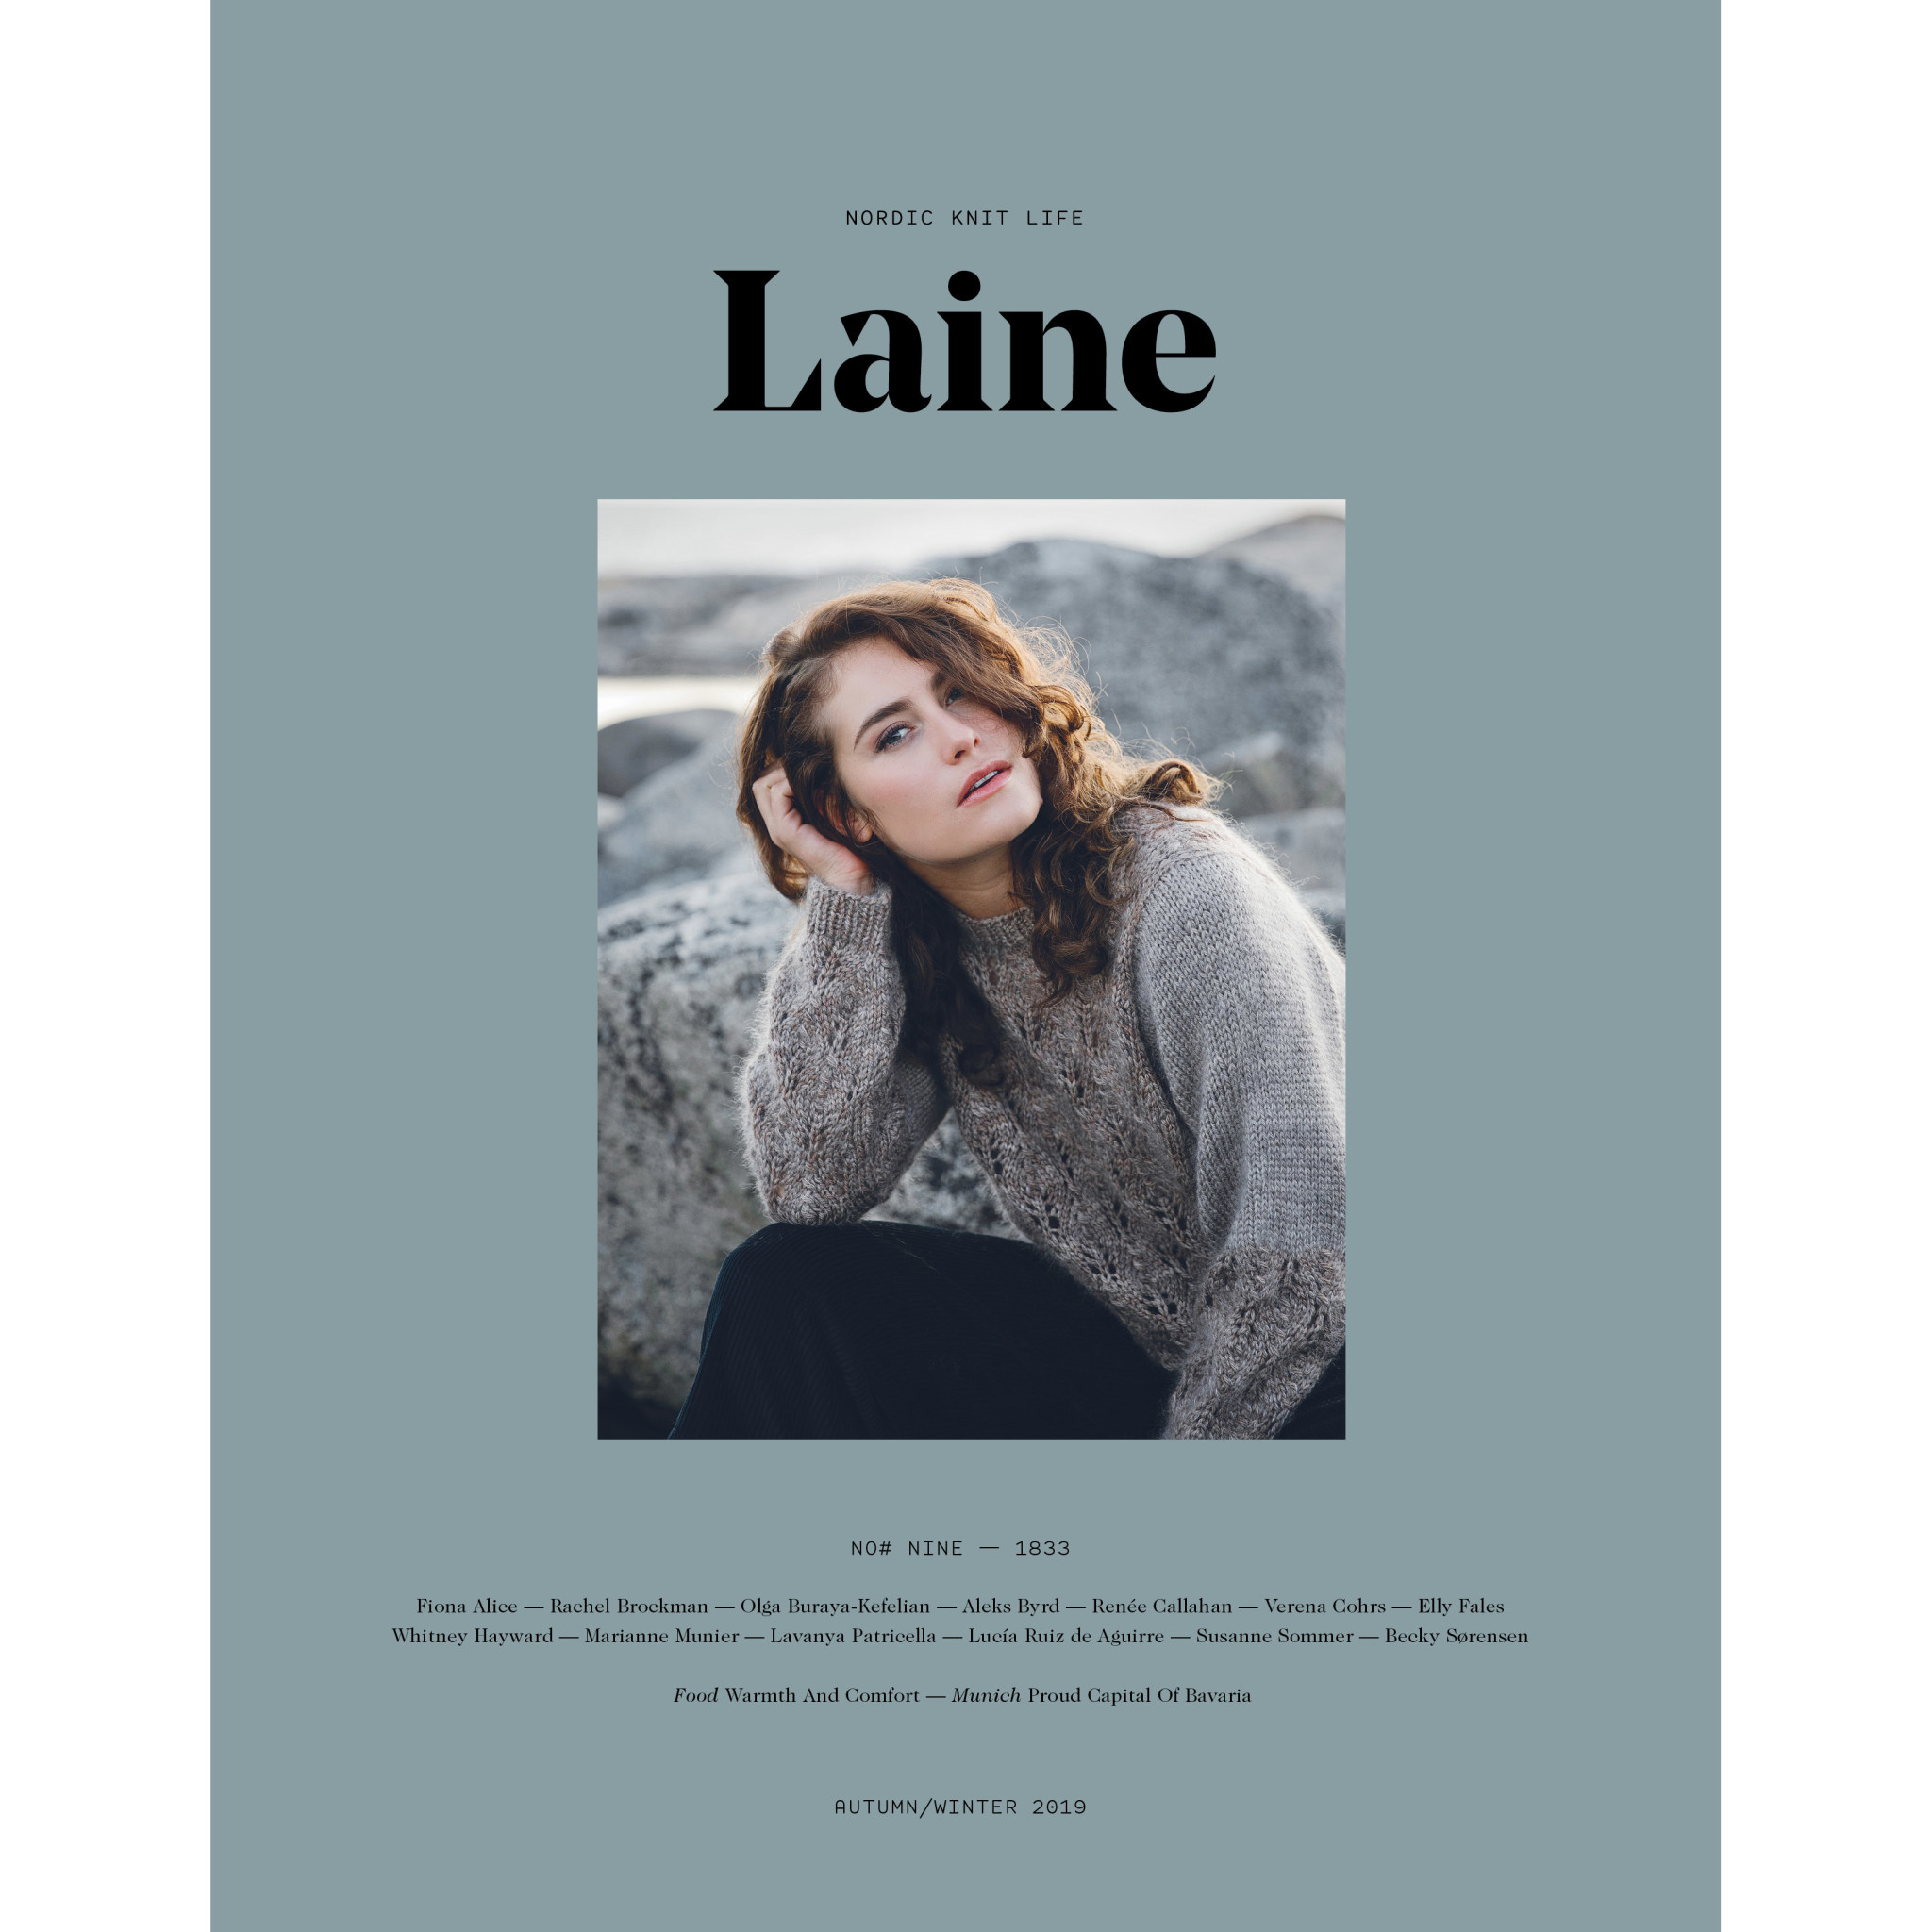 Laine LAINE NORDIC KNIT LIFE ISSUE 9